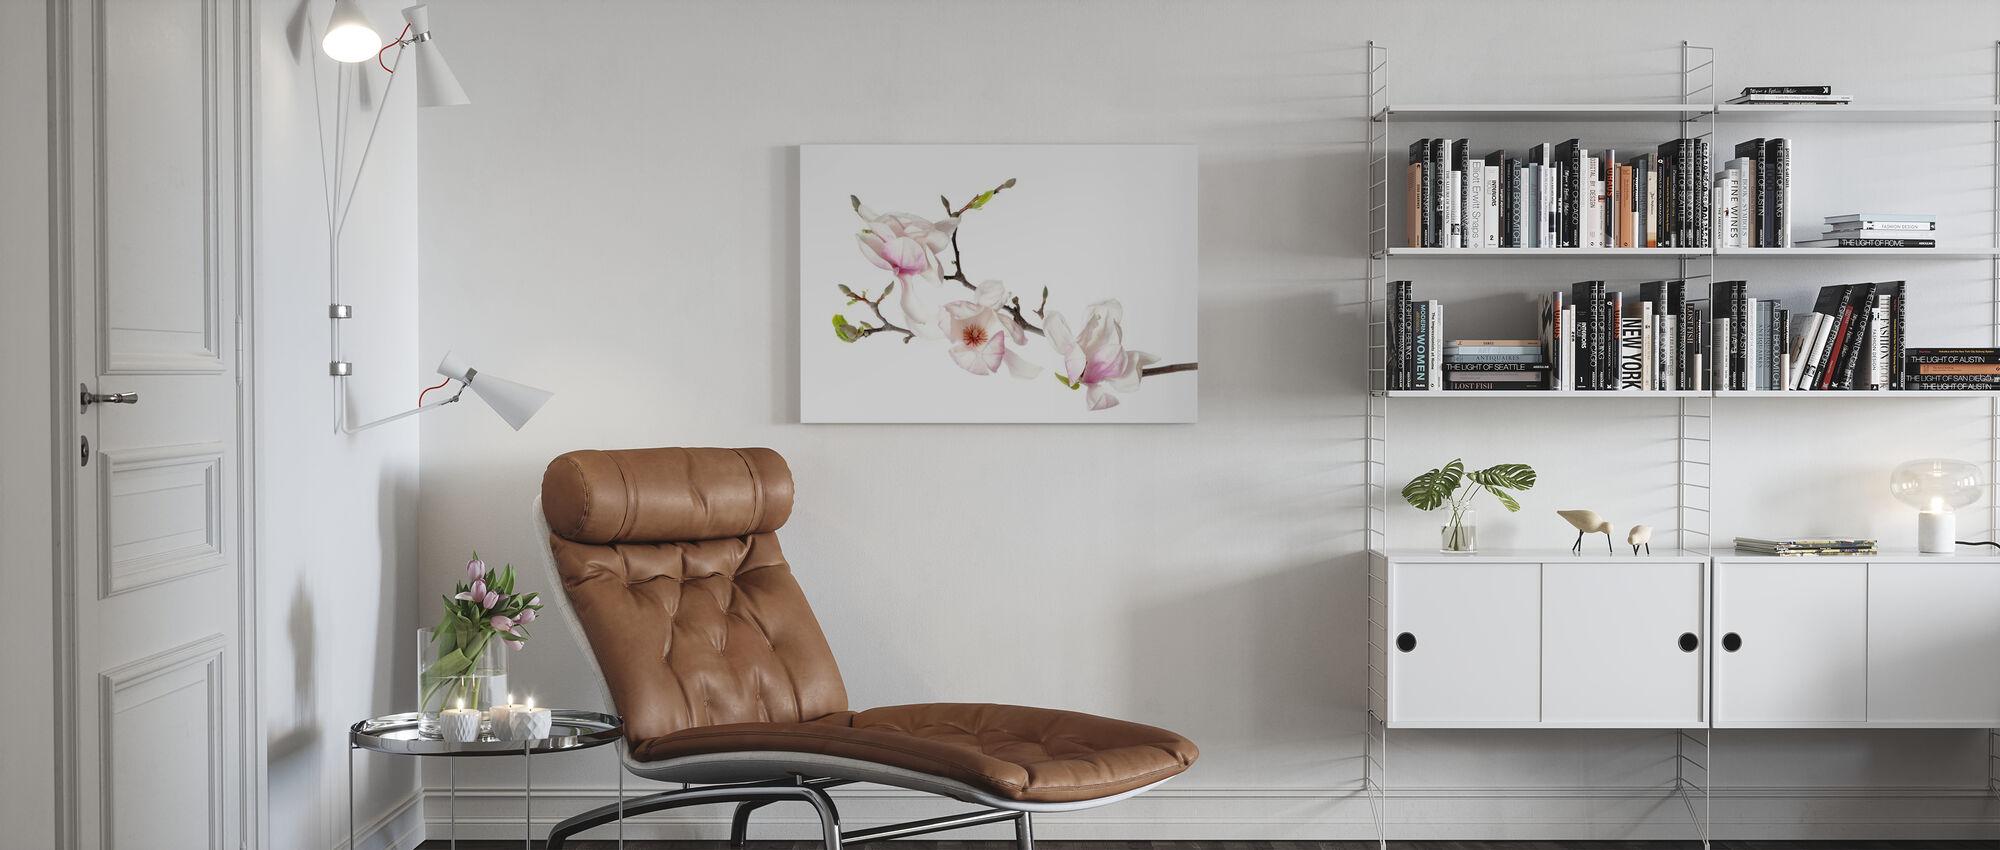 Orchideenknospen - Leinwandbild - Wohnzimmer